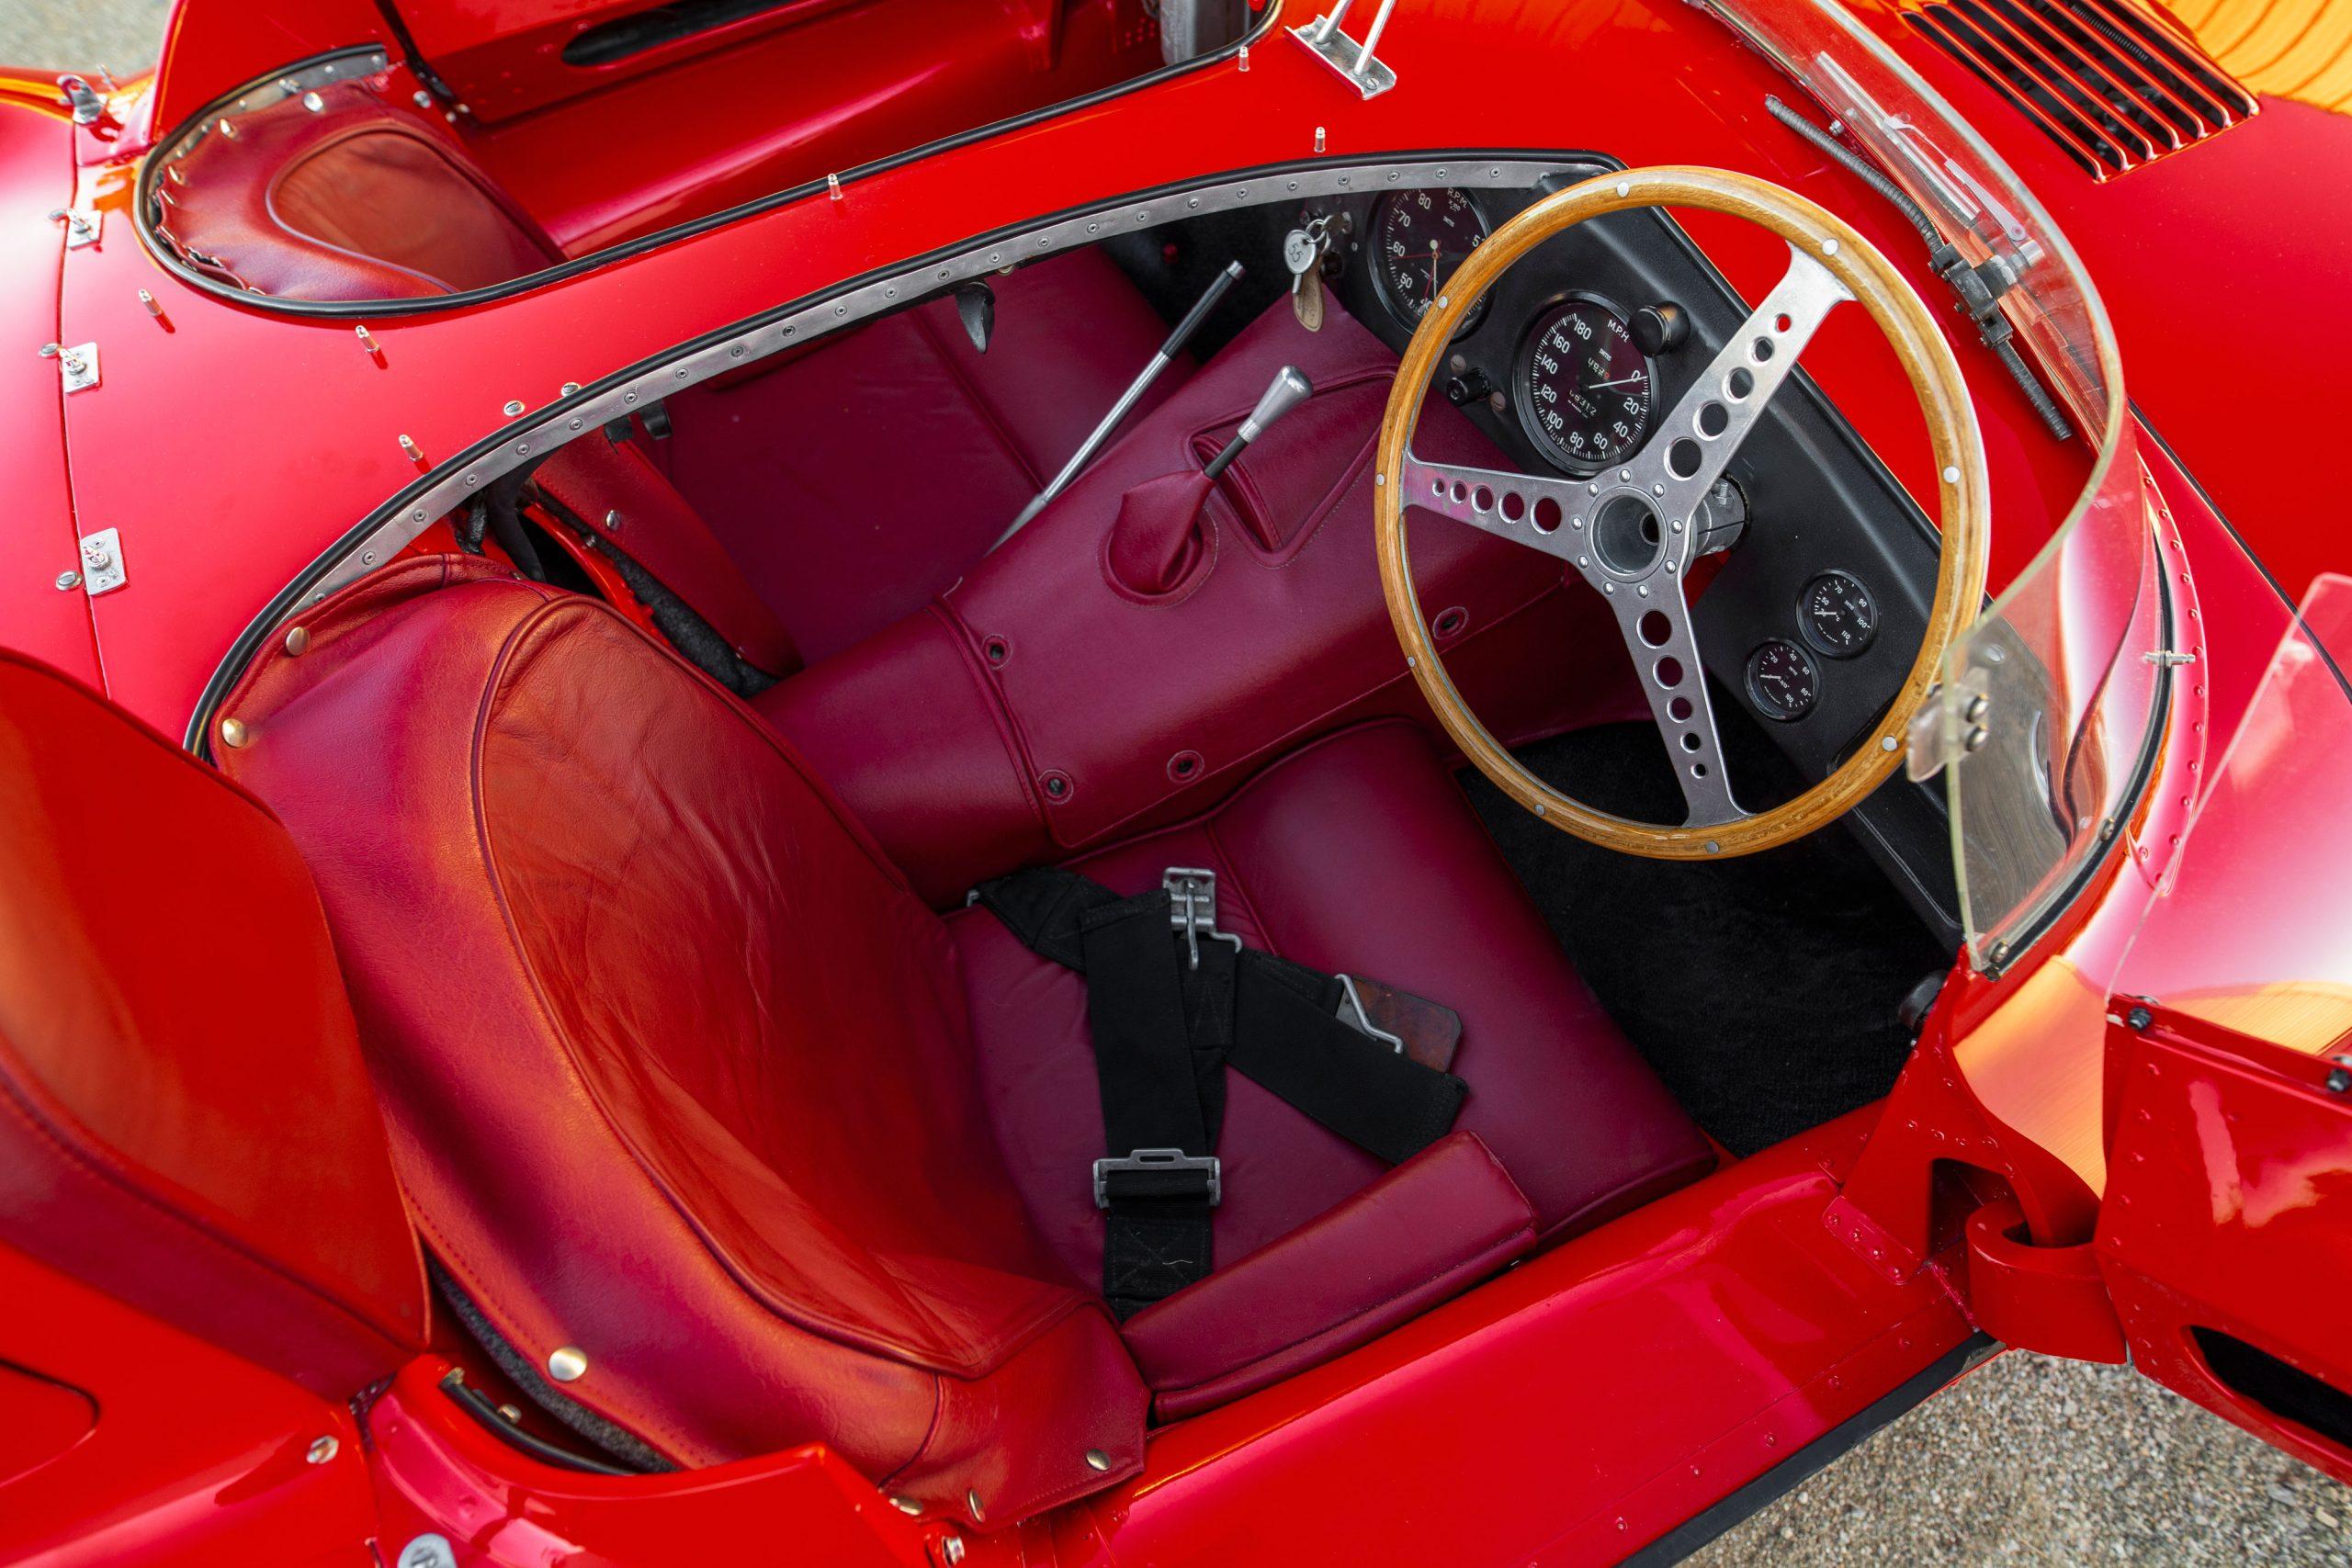 1955 Jaguar D-Type interior